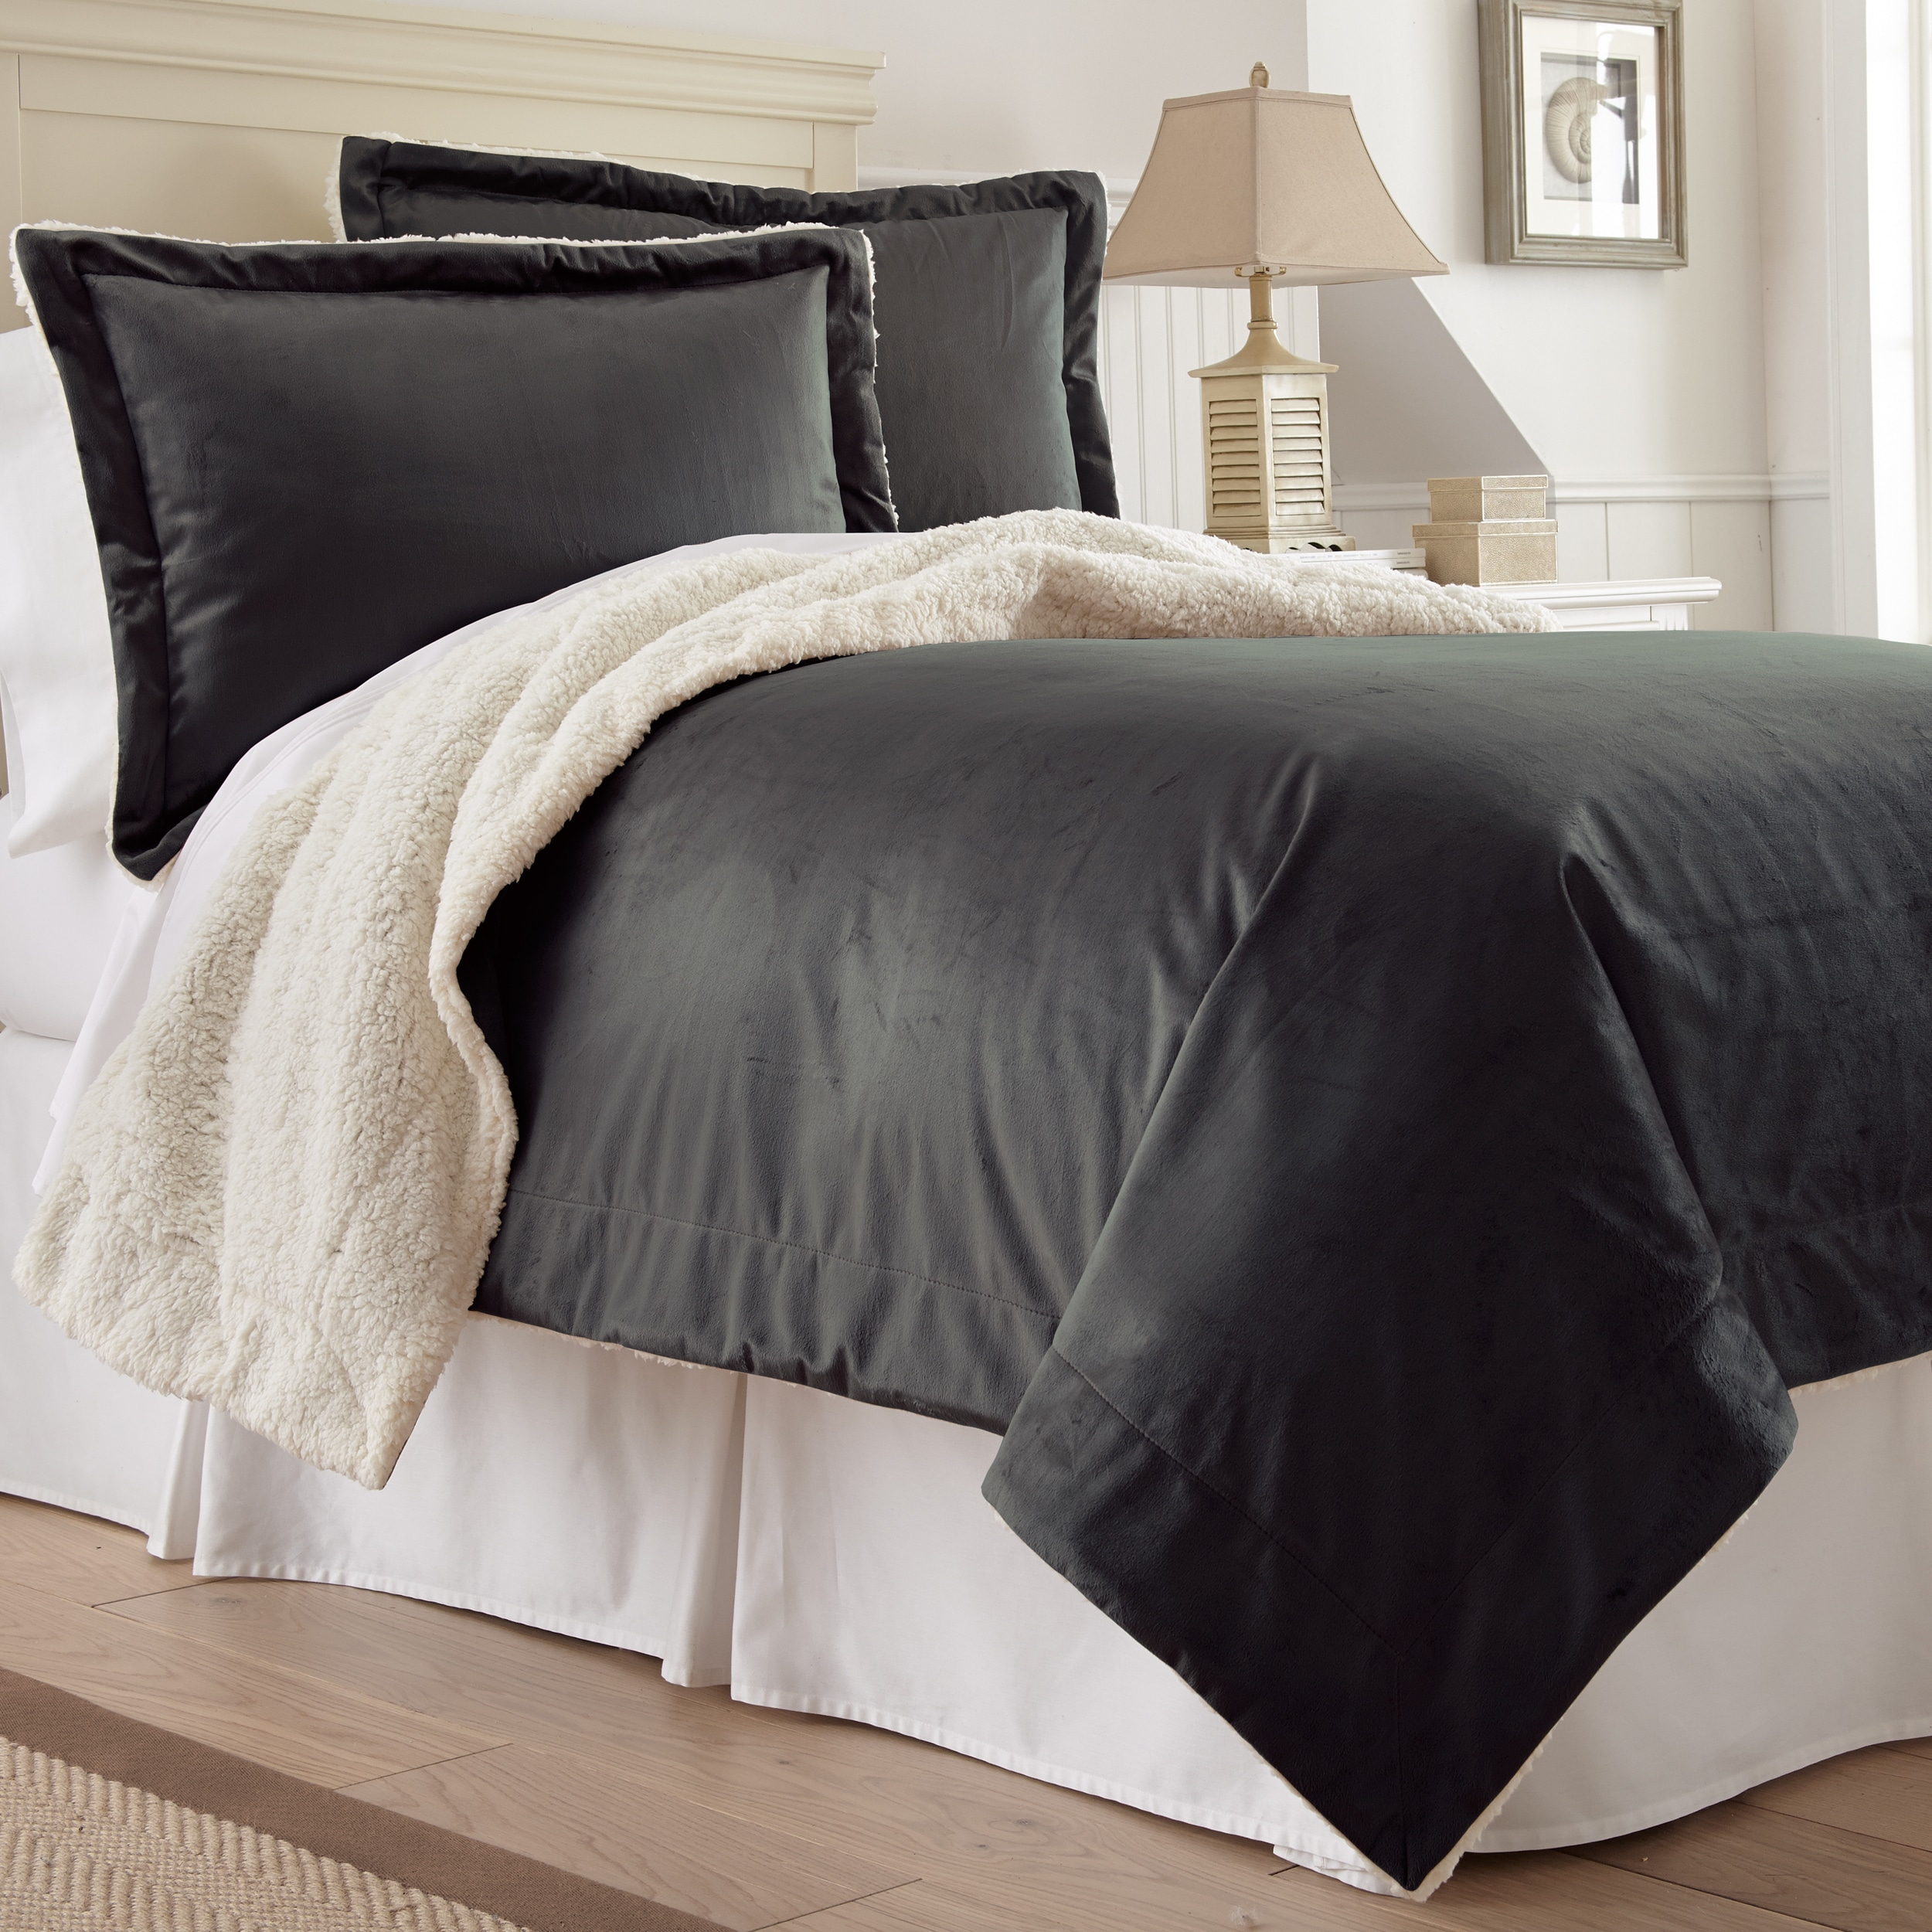 Amraupur Overseas Serta 3-piece Mink/ Sherpa Comforter Se...